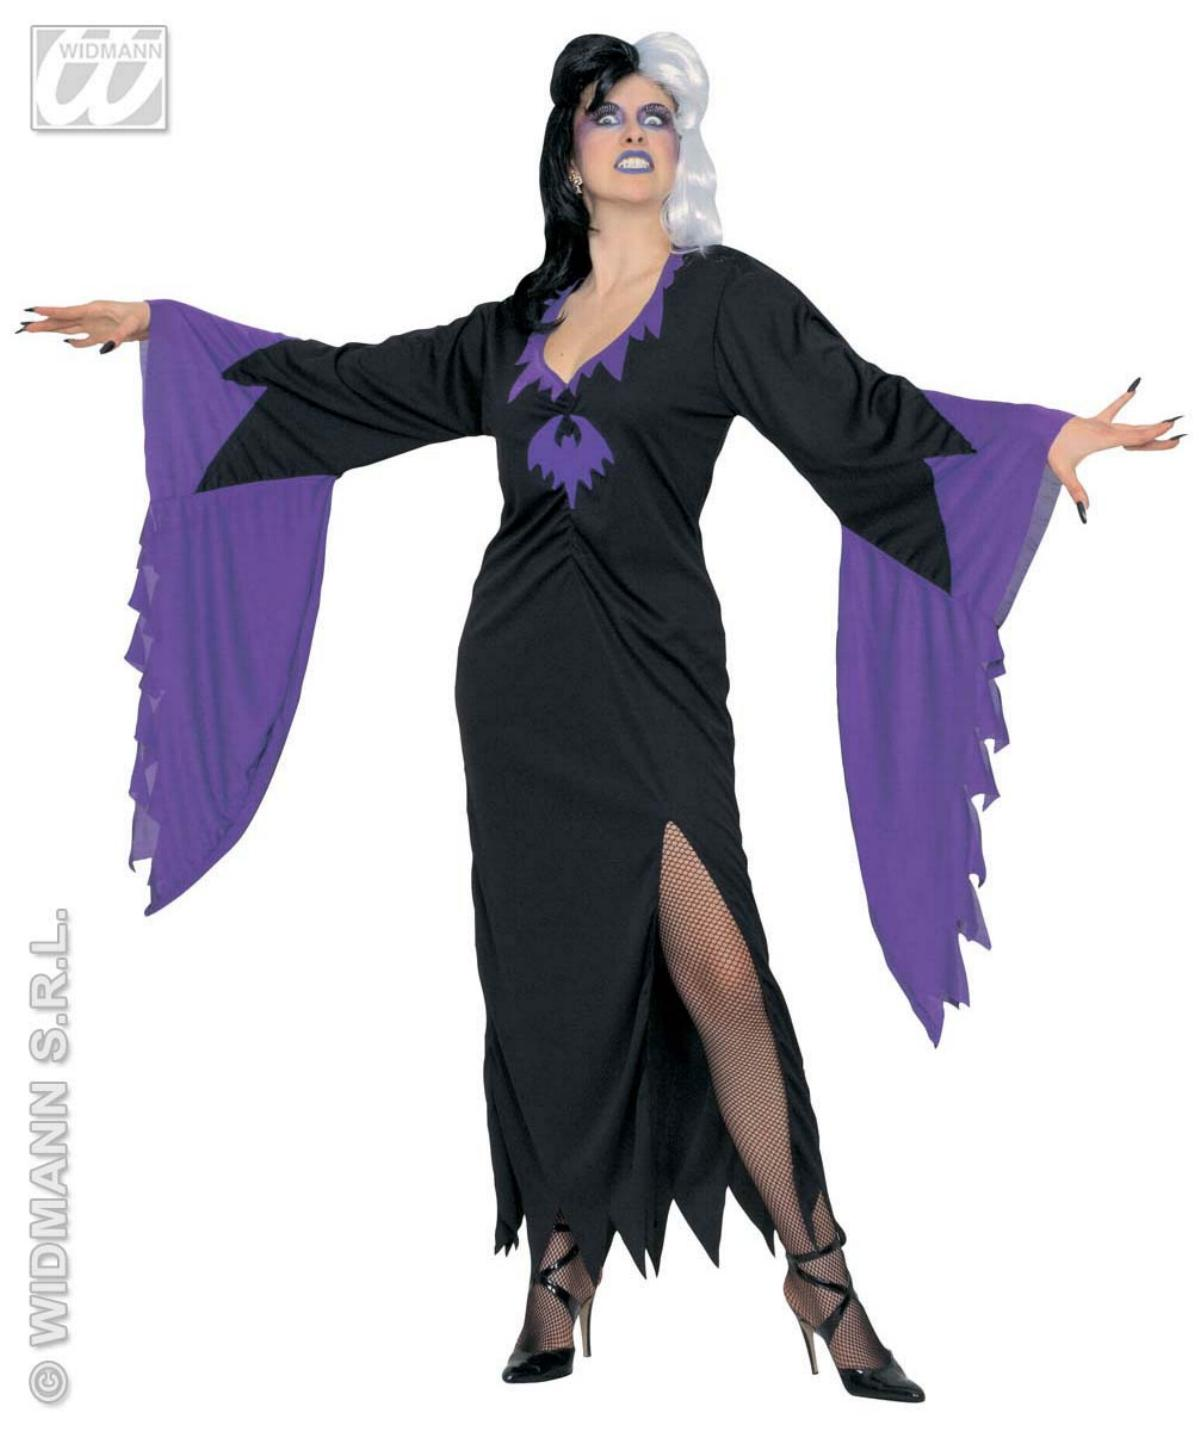 Hexen Kostüm,Gothic Monster, m. Fledermausärmel S, M, L, XL, XXL  3942